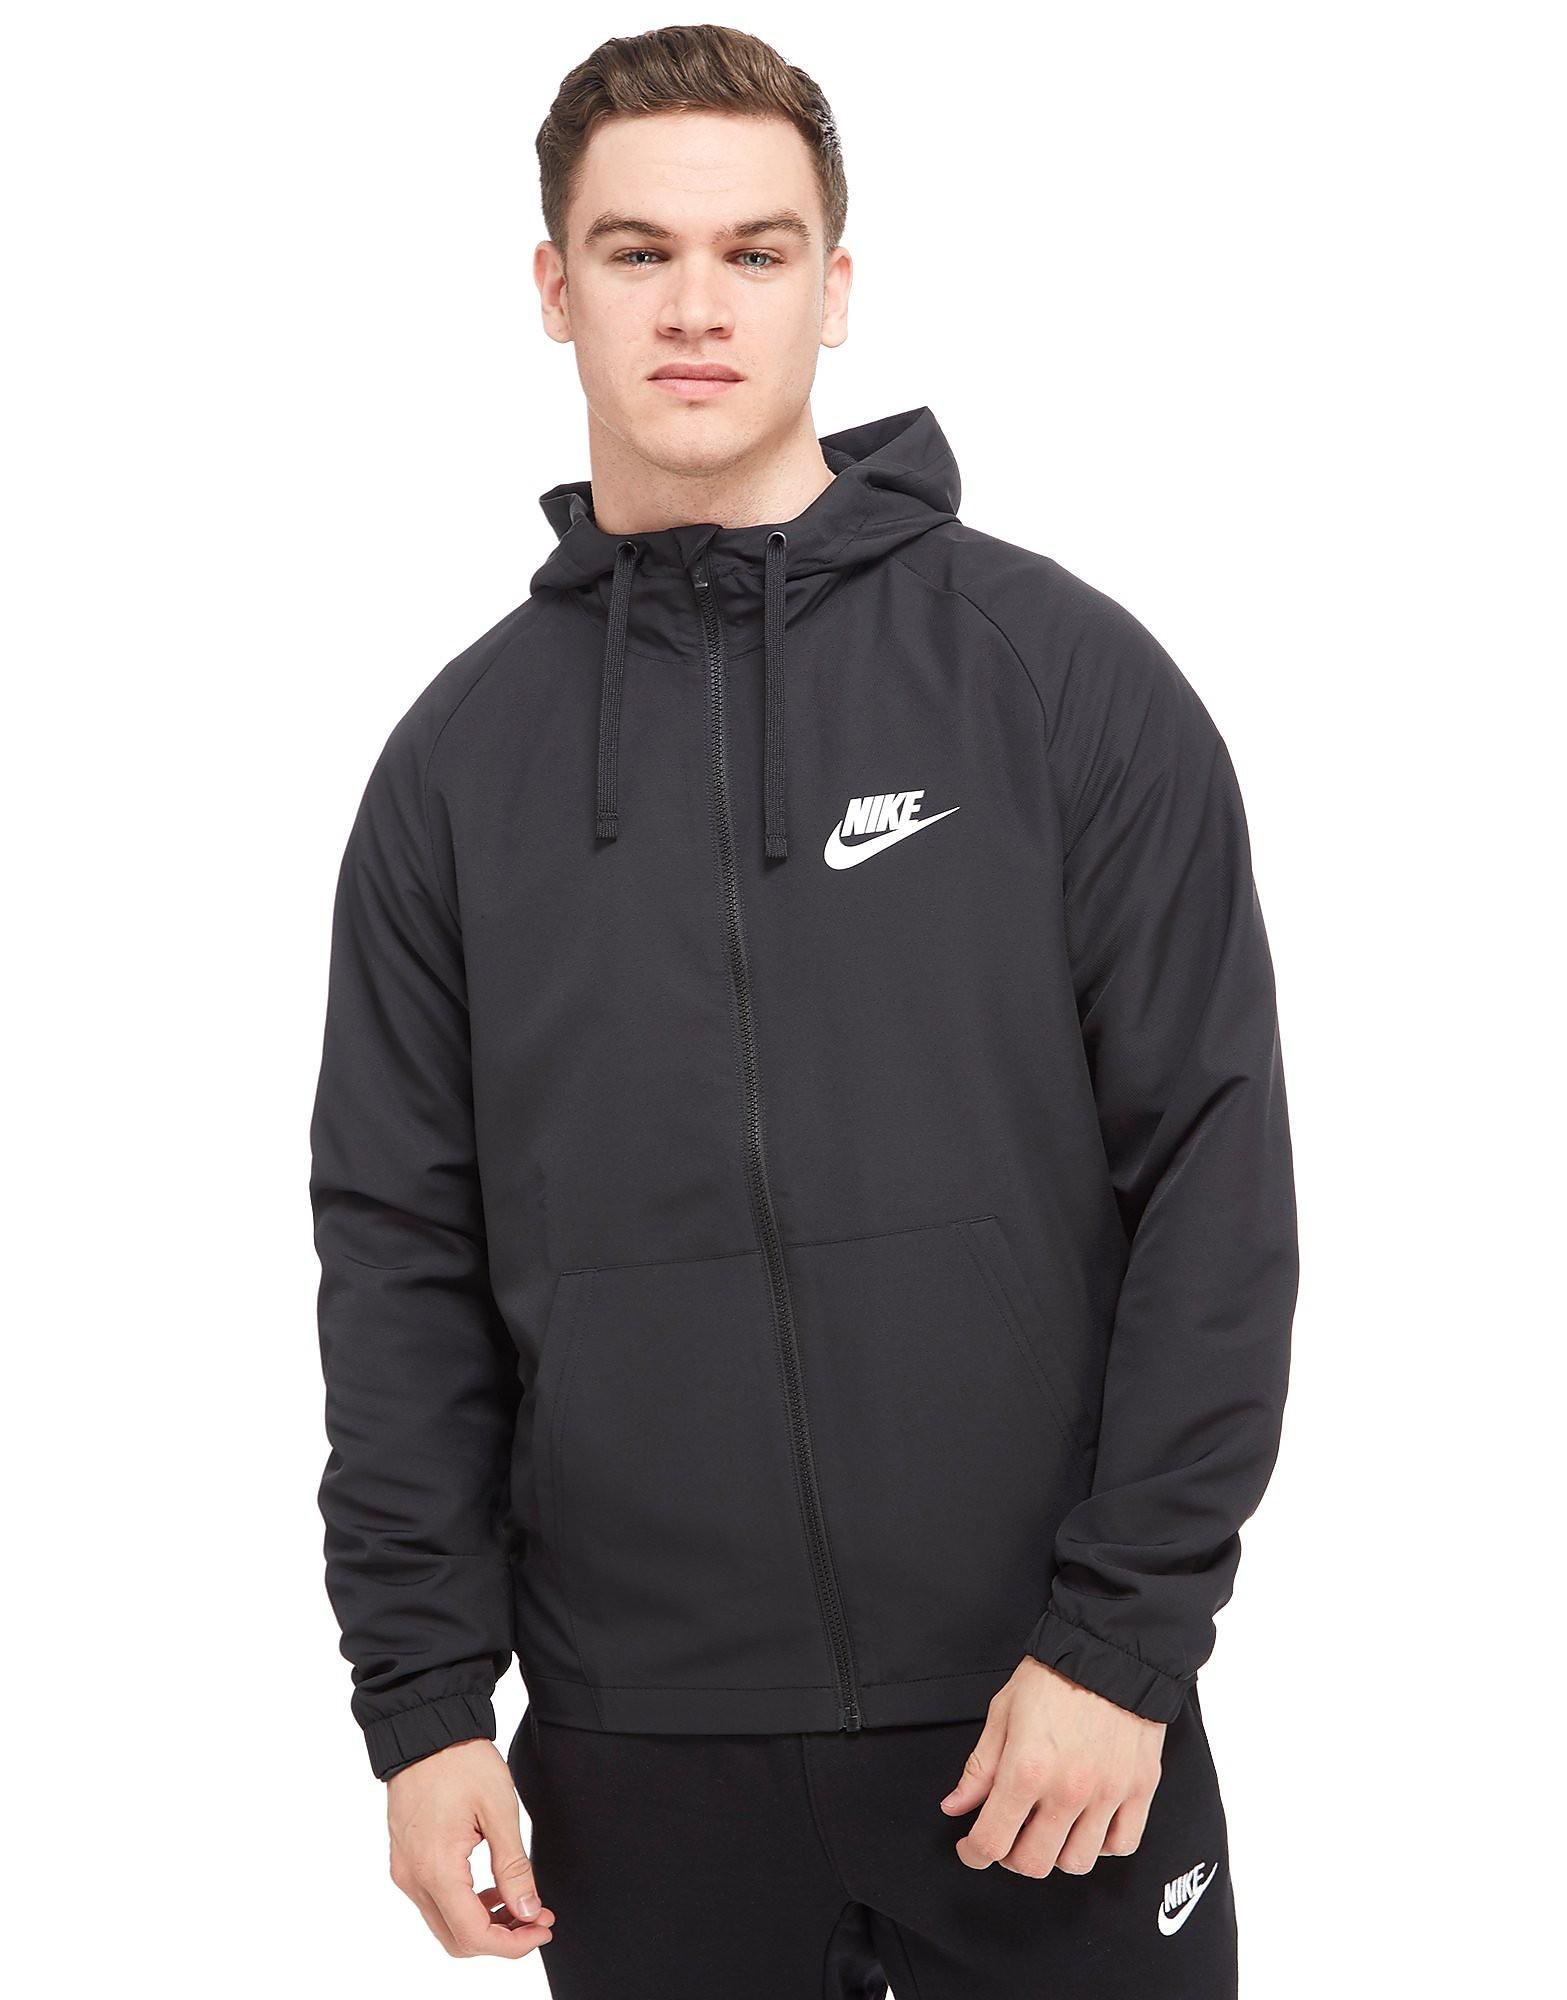 Nike Shut Out 2 Woven Hoodie